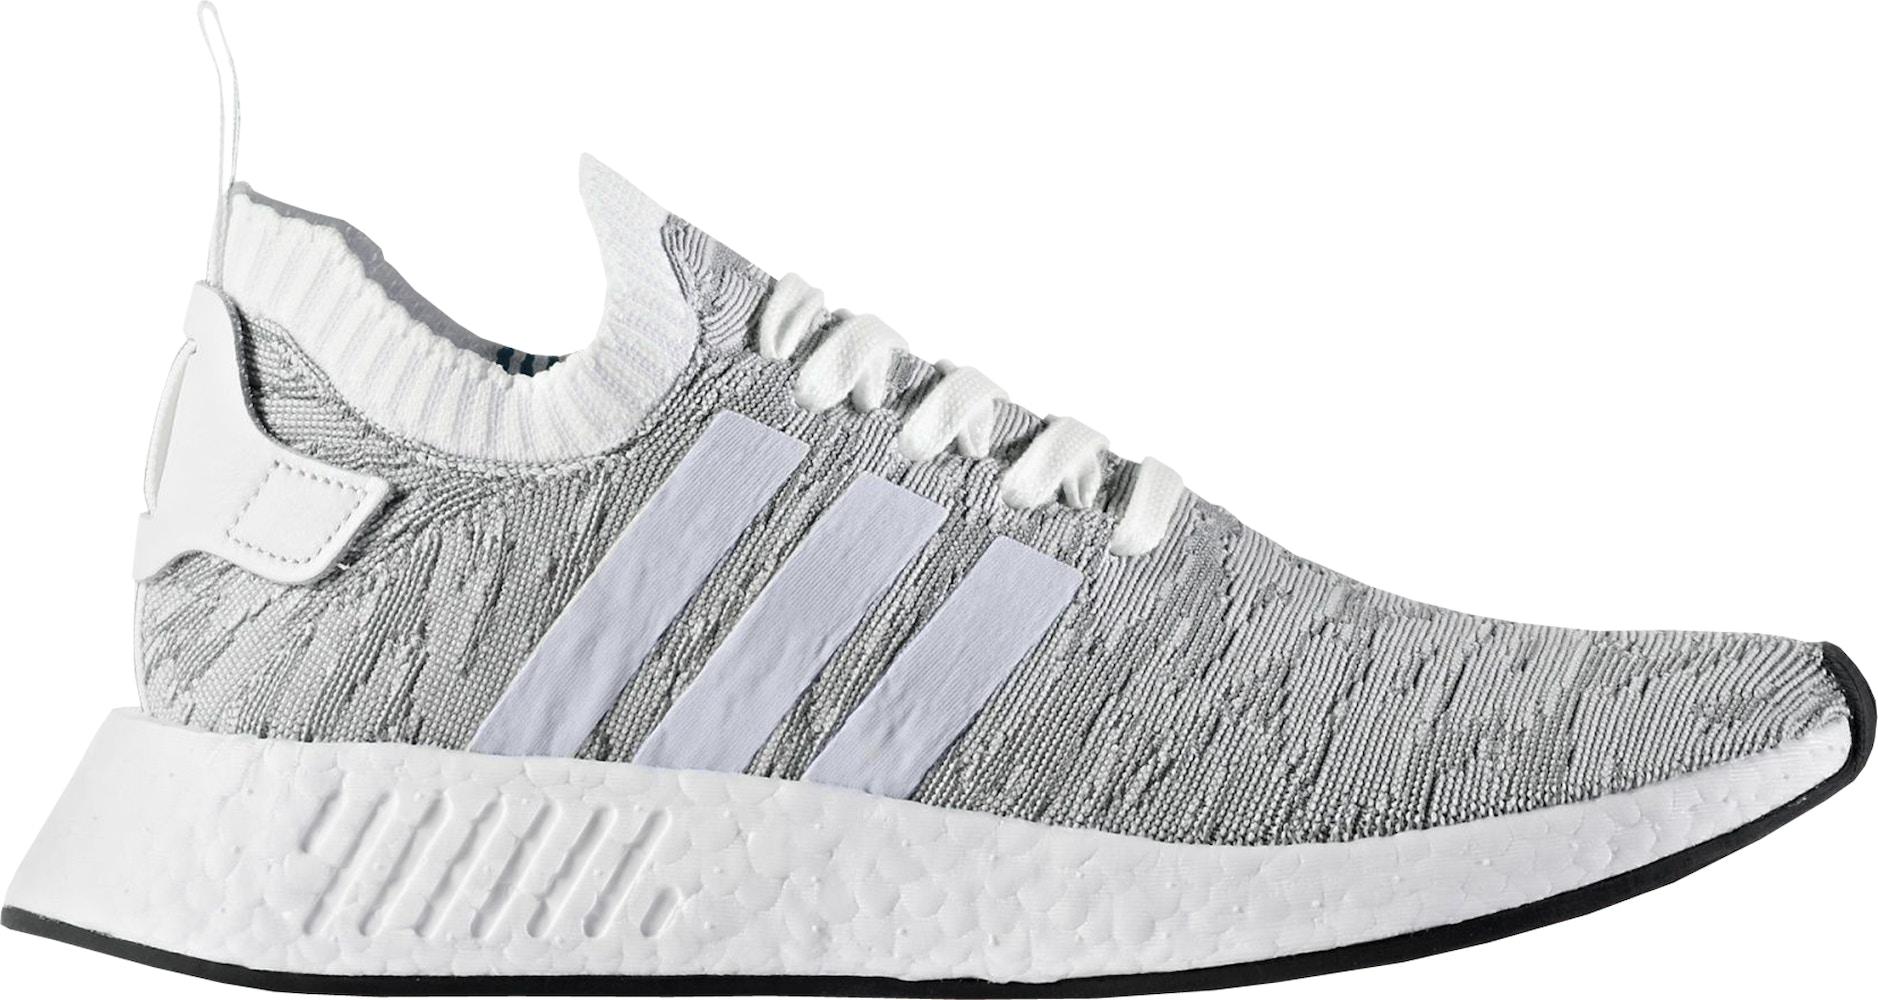 adidas NMD R2 Primeknit White Black